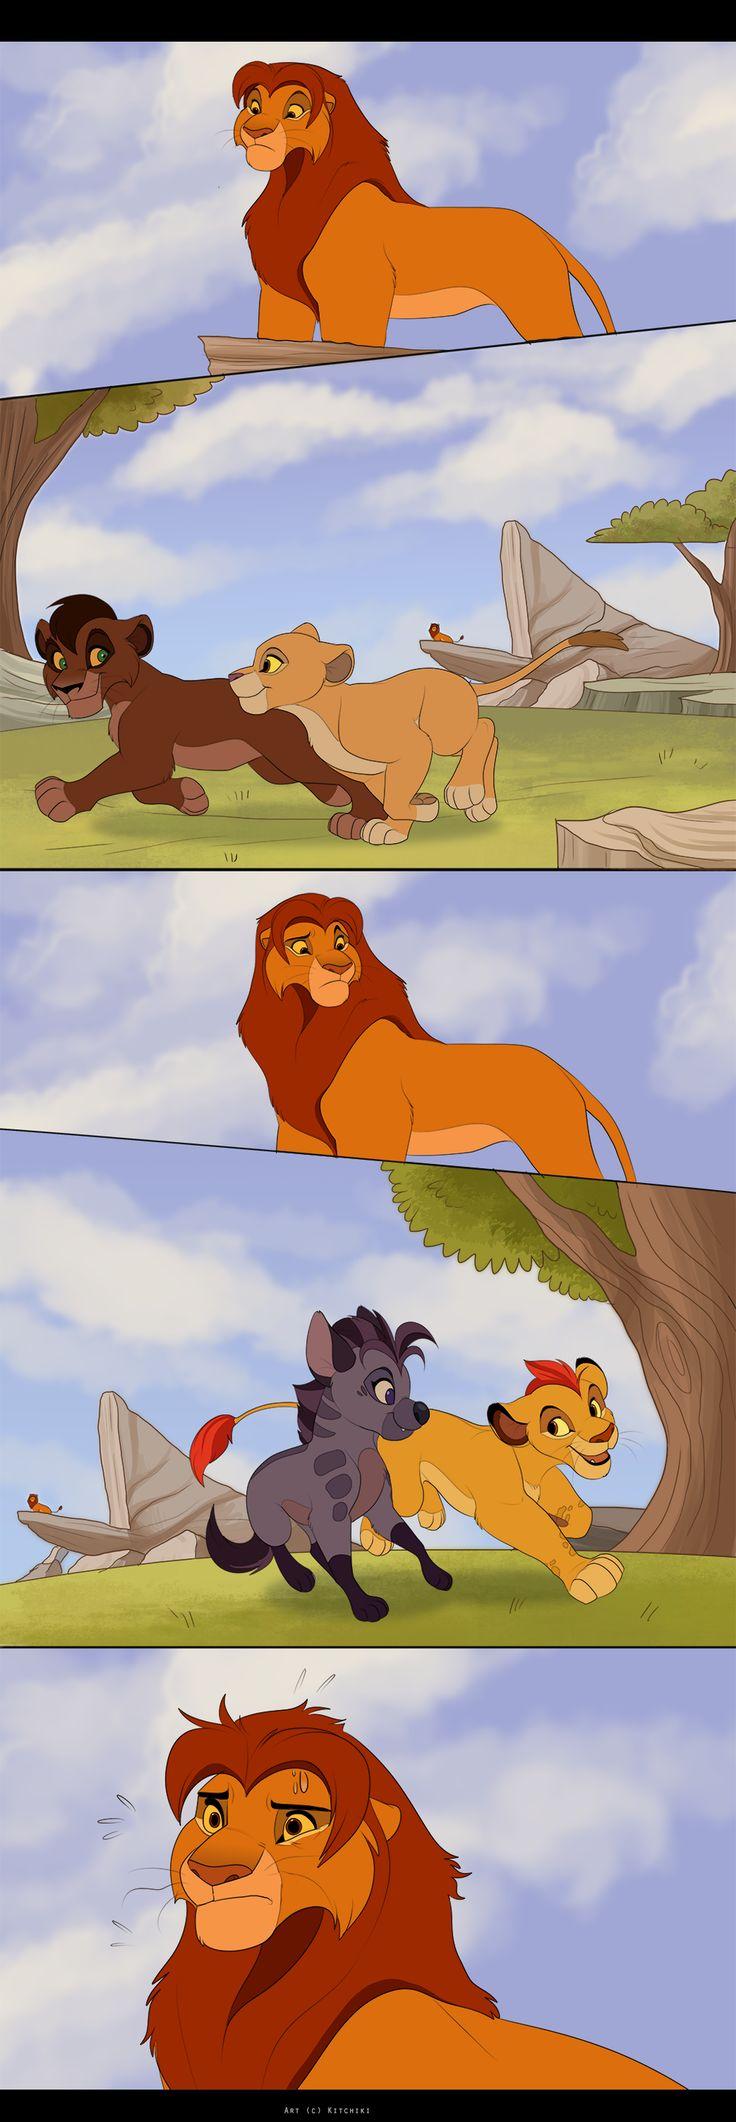 Simba's Dilemma by Kitchiki.deviantart.com on @DeviantArt